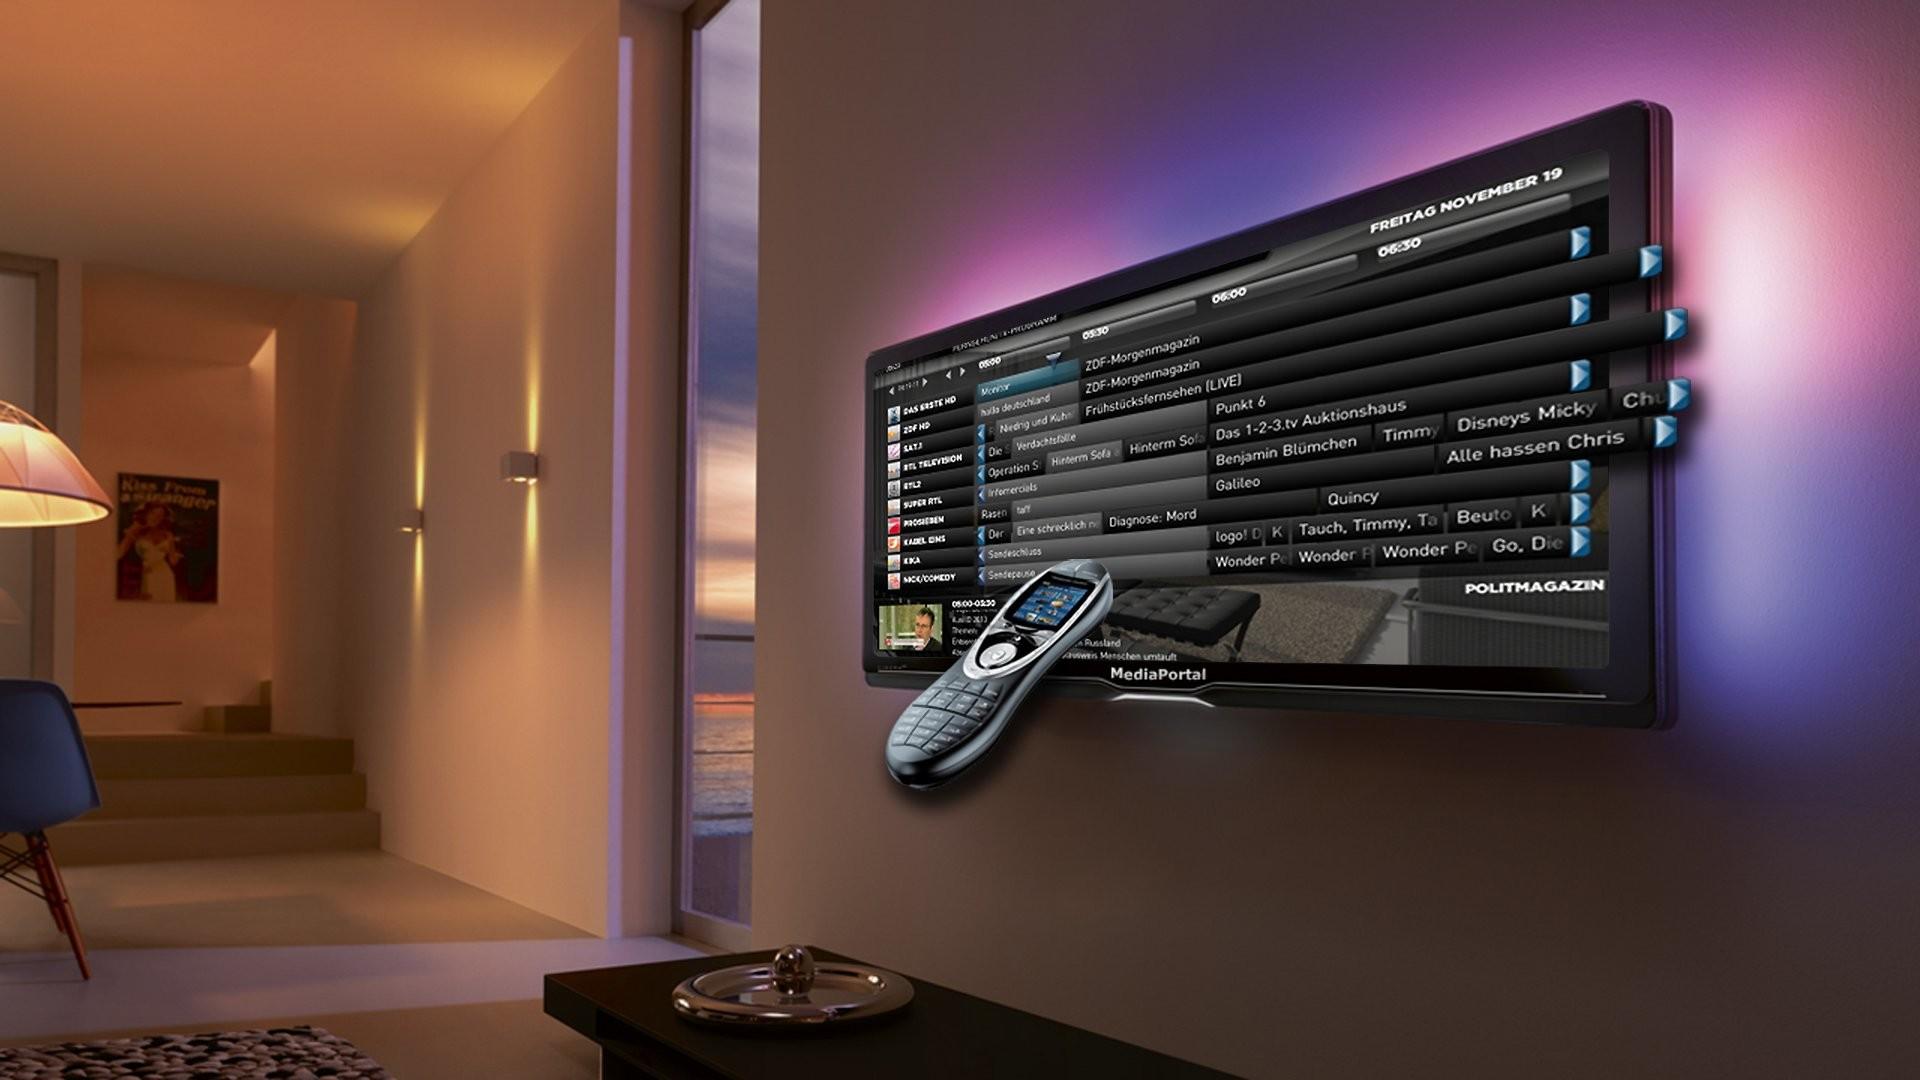 situations, creative design, wallpaper hd, desktop hd, tv, ship, wave